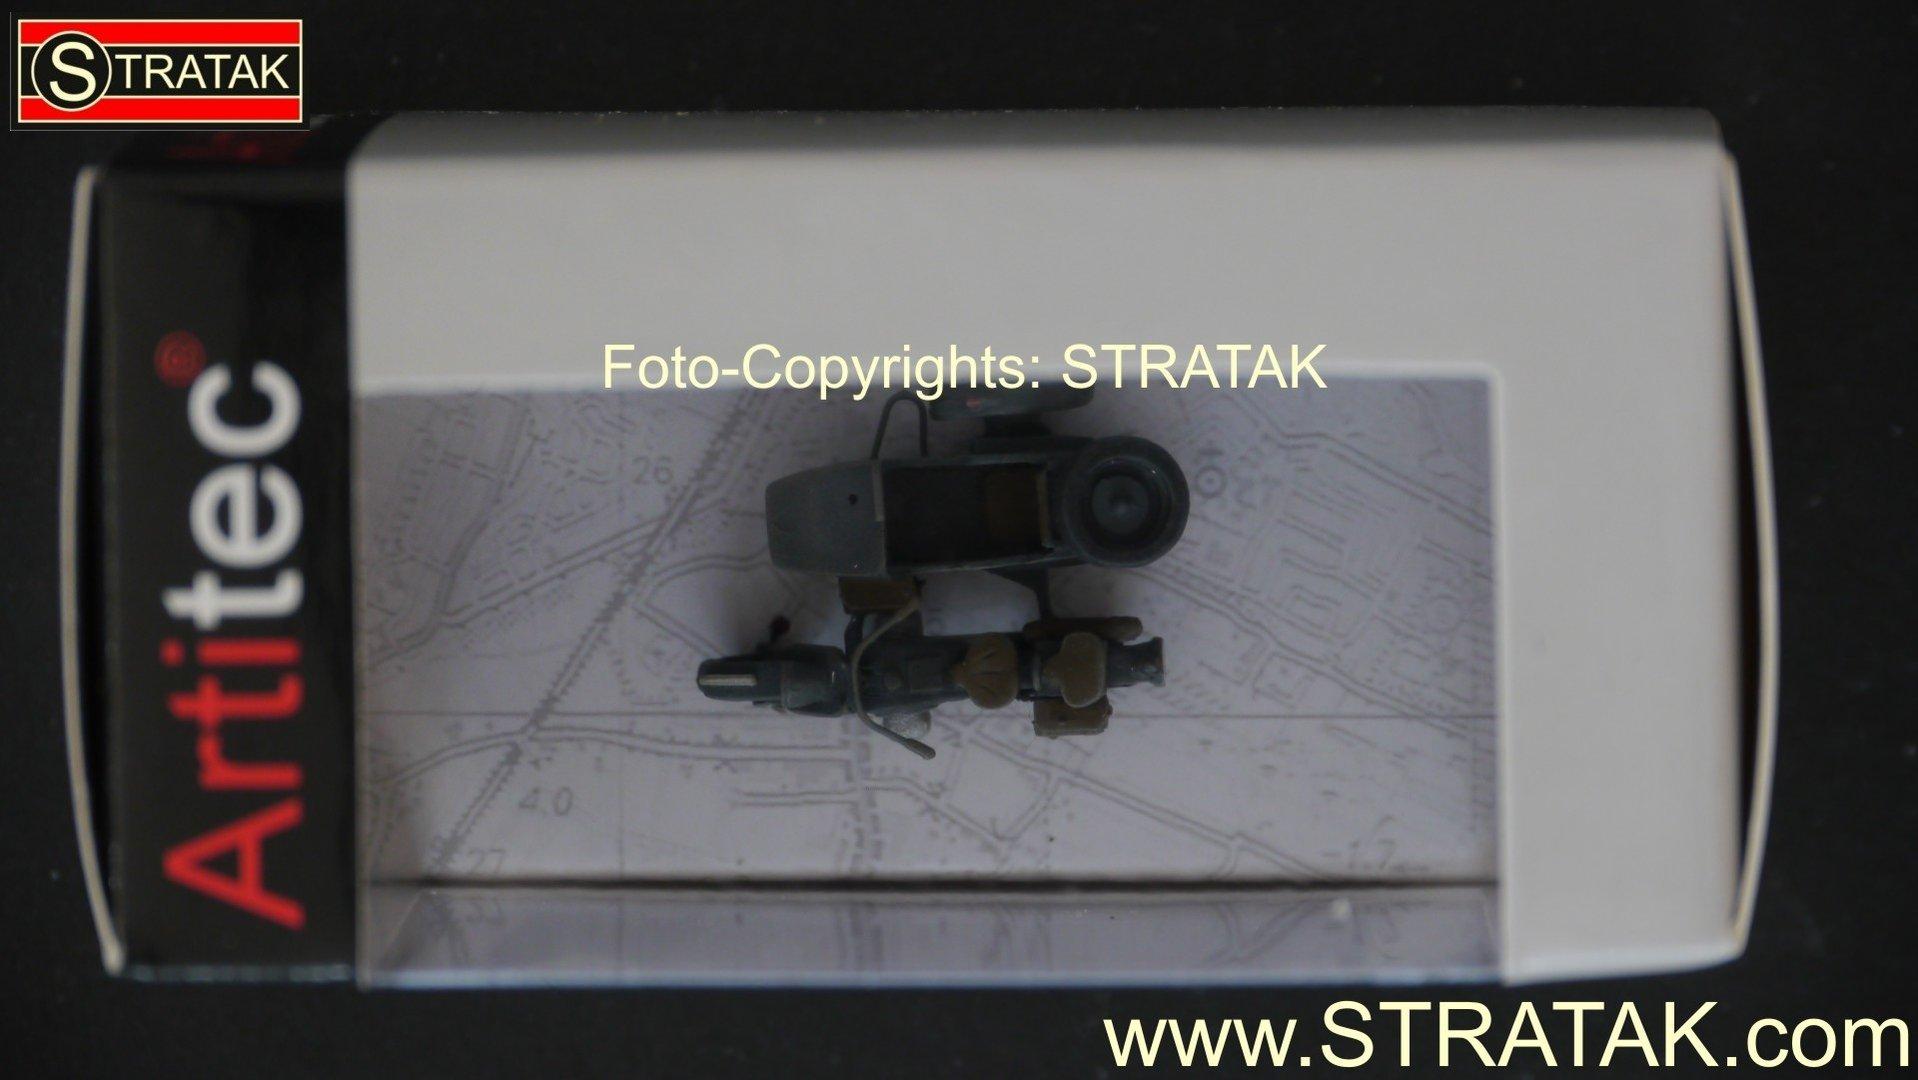 ZY16020 12pcs  Freizeit Stuhl Sofa Bank Modelleisenbahn Eisenbahn Spur G 1:20